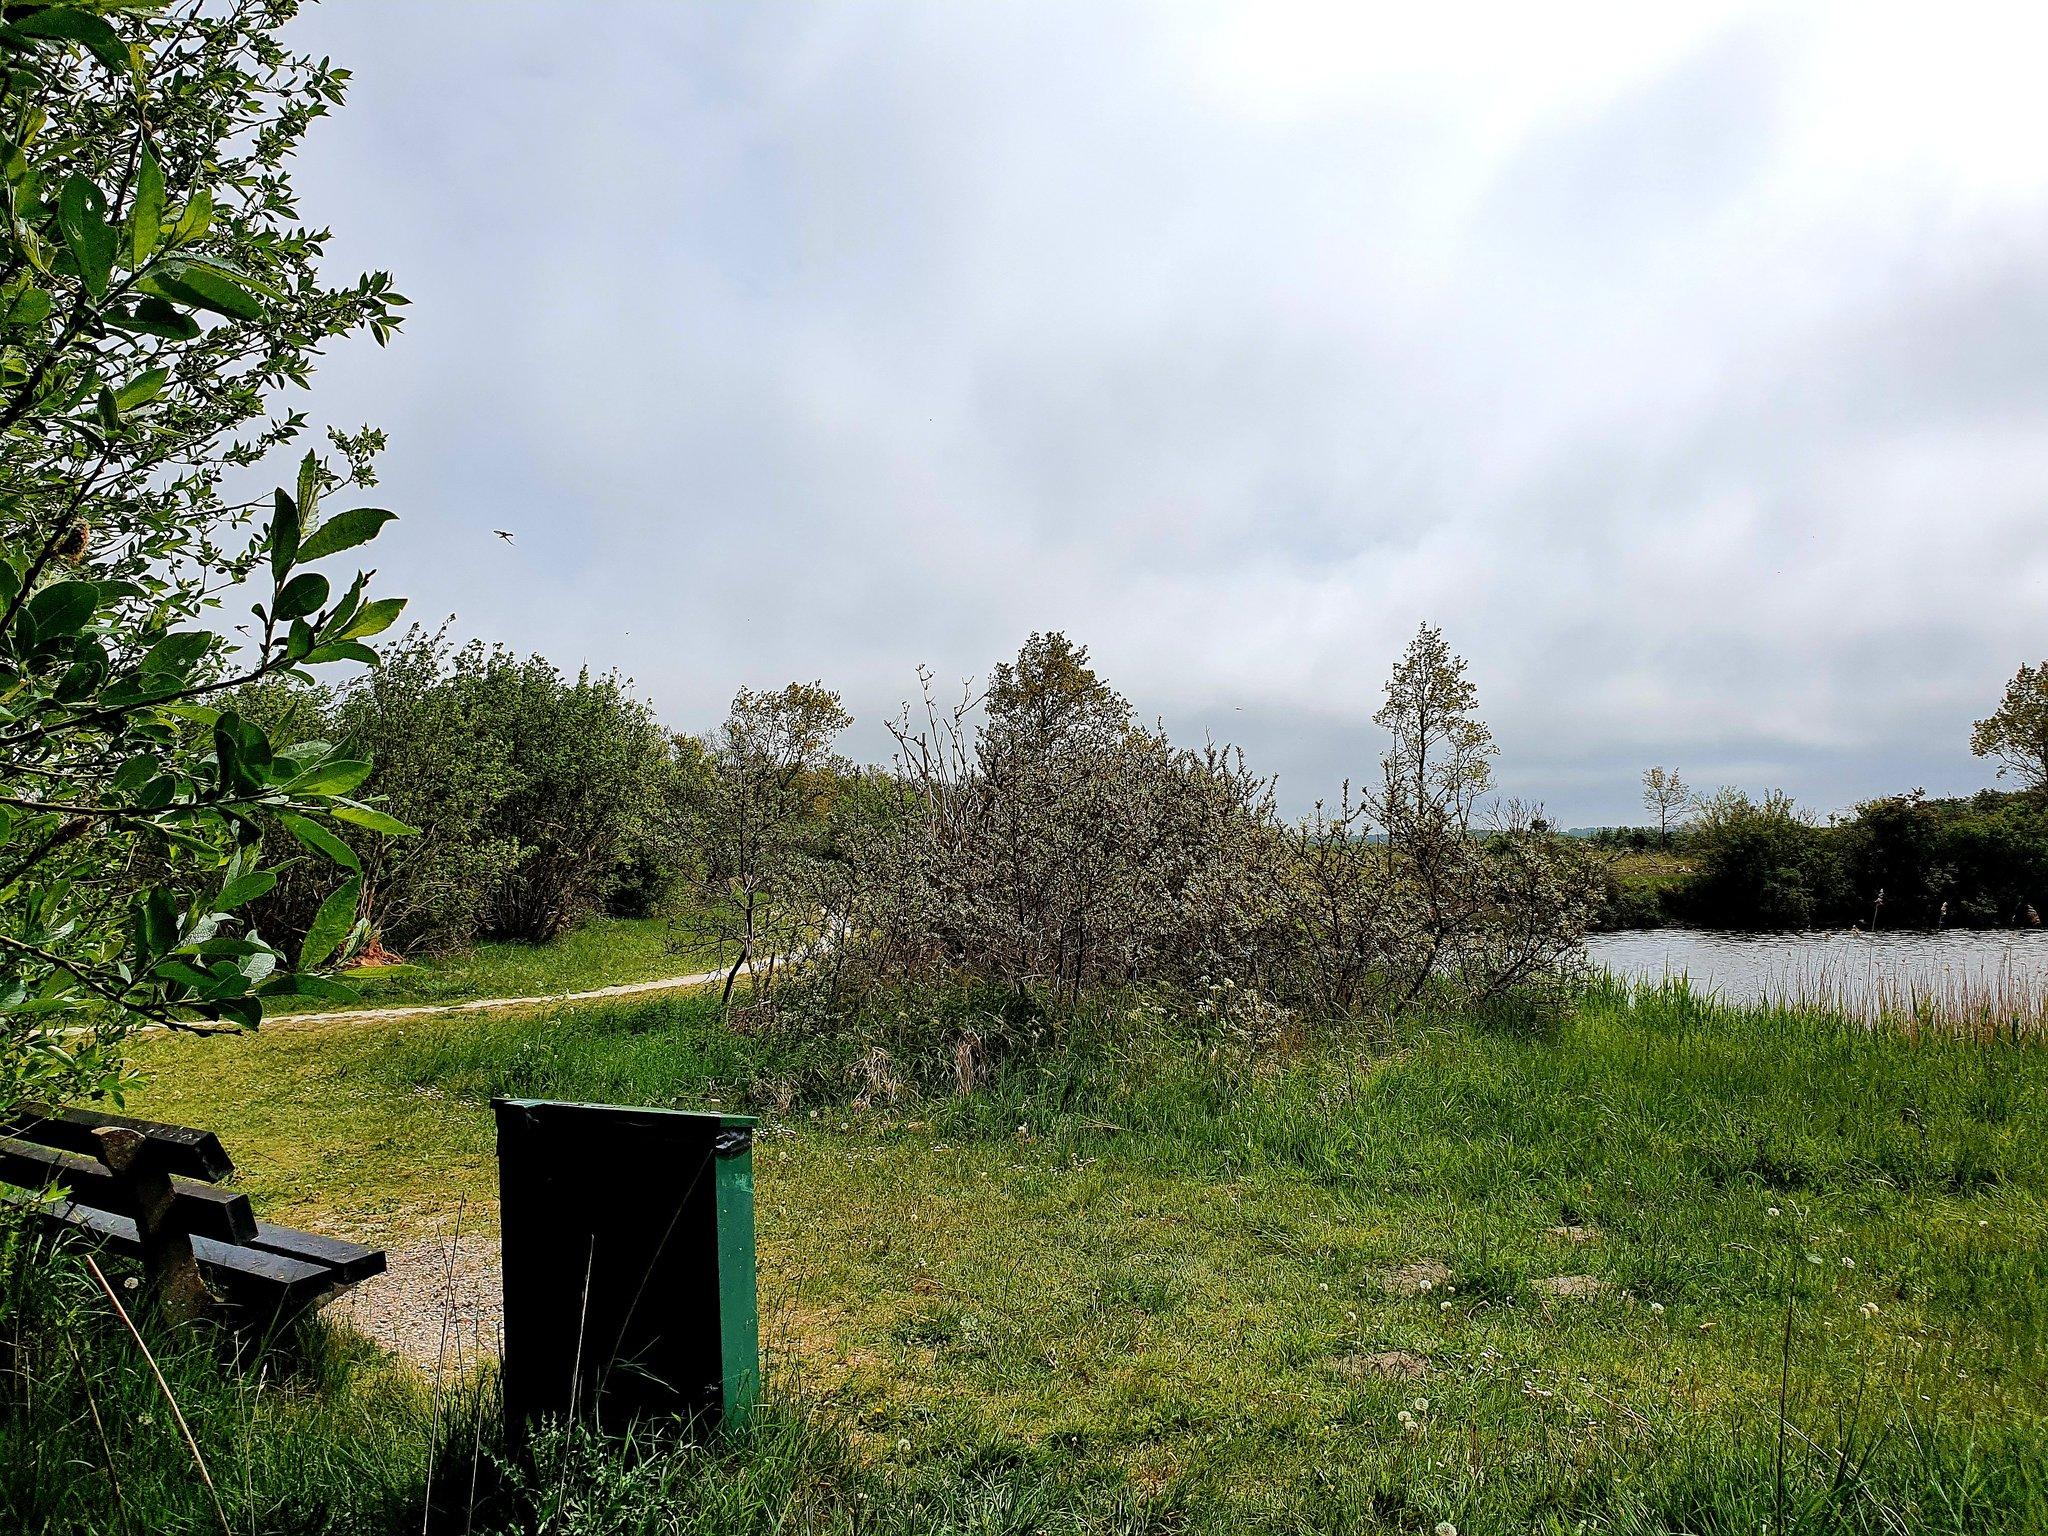 rt-wolfswandelplan-np-lauwersmeer-wandelbankjes-https-t-co-0eonaivsuv